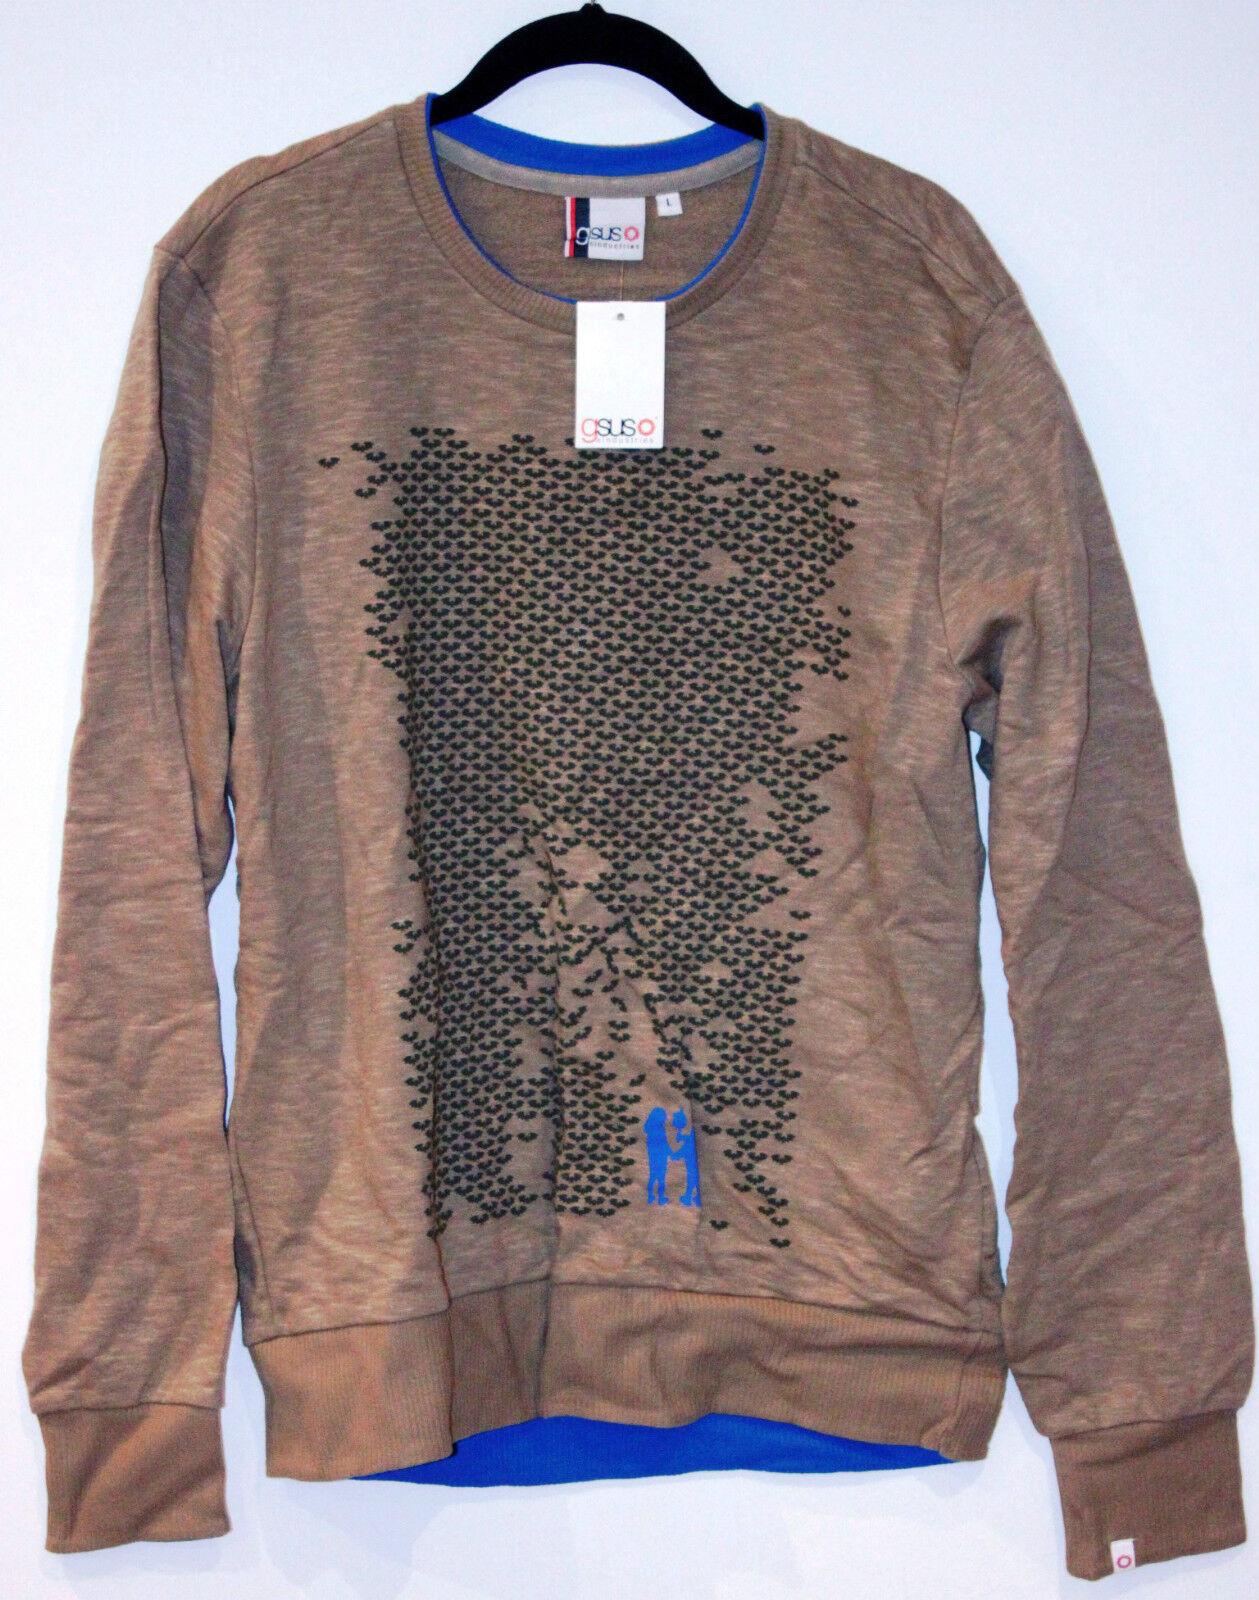 GSUS INDUSTRIES Olive Pixie Grün Sweatshirt terry Interior Cotton Bats L 110